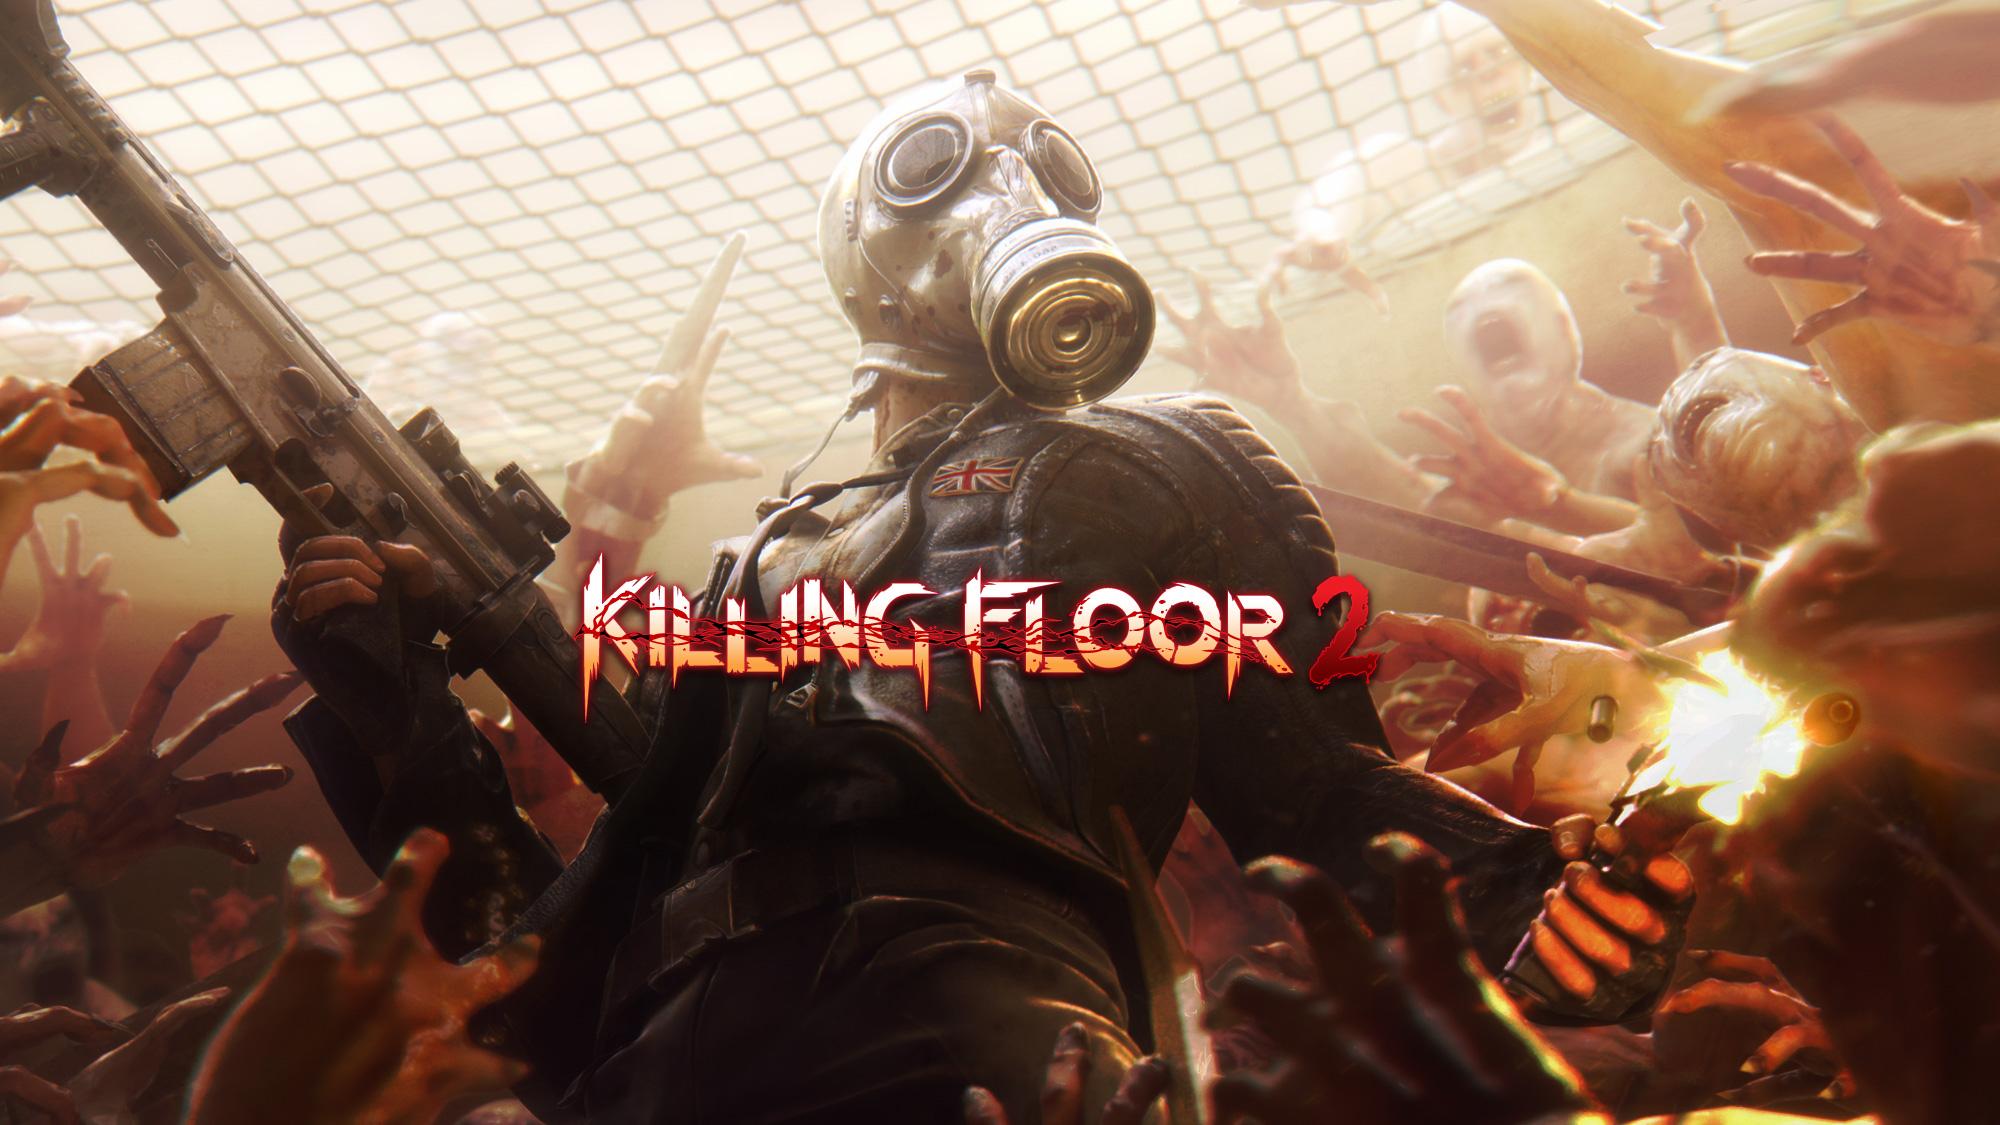 killing-floor-2-listing-thumb-01-ps4-us-09dec14.jpg